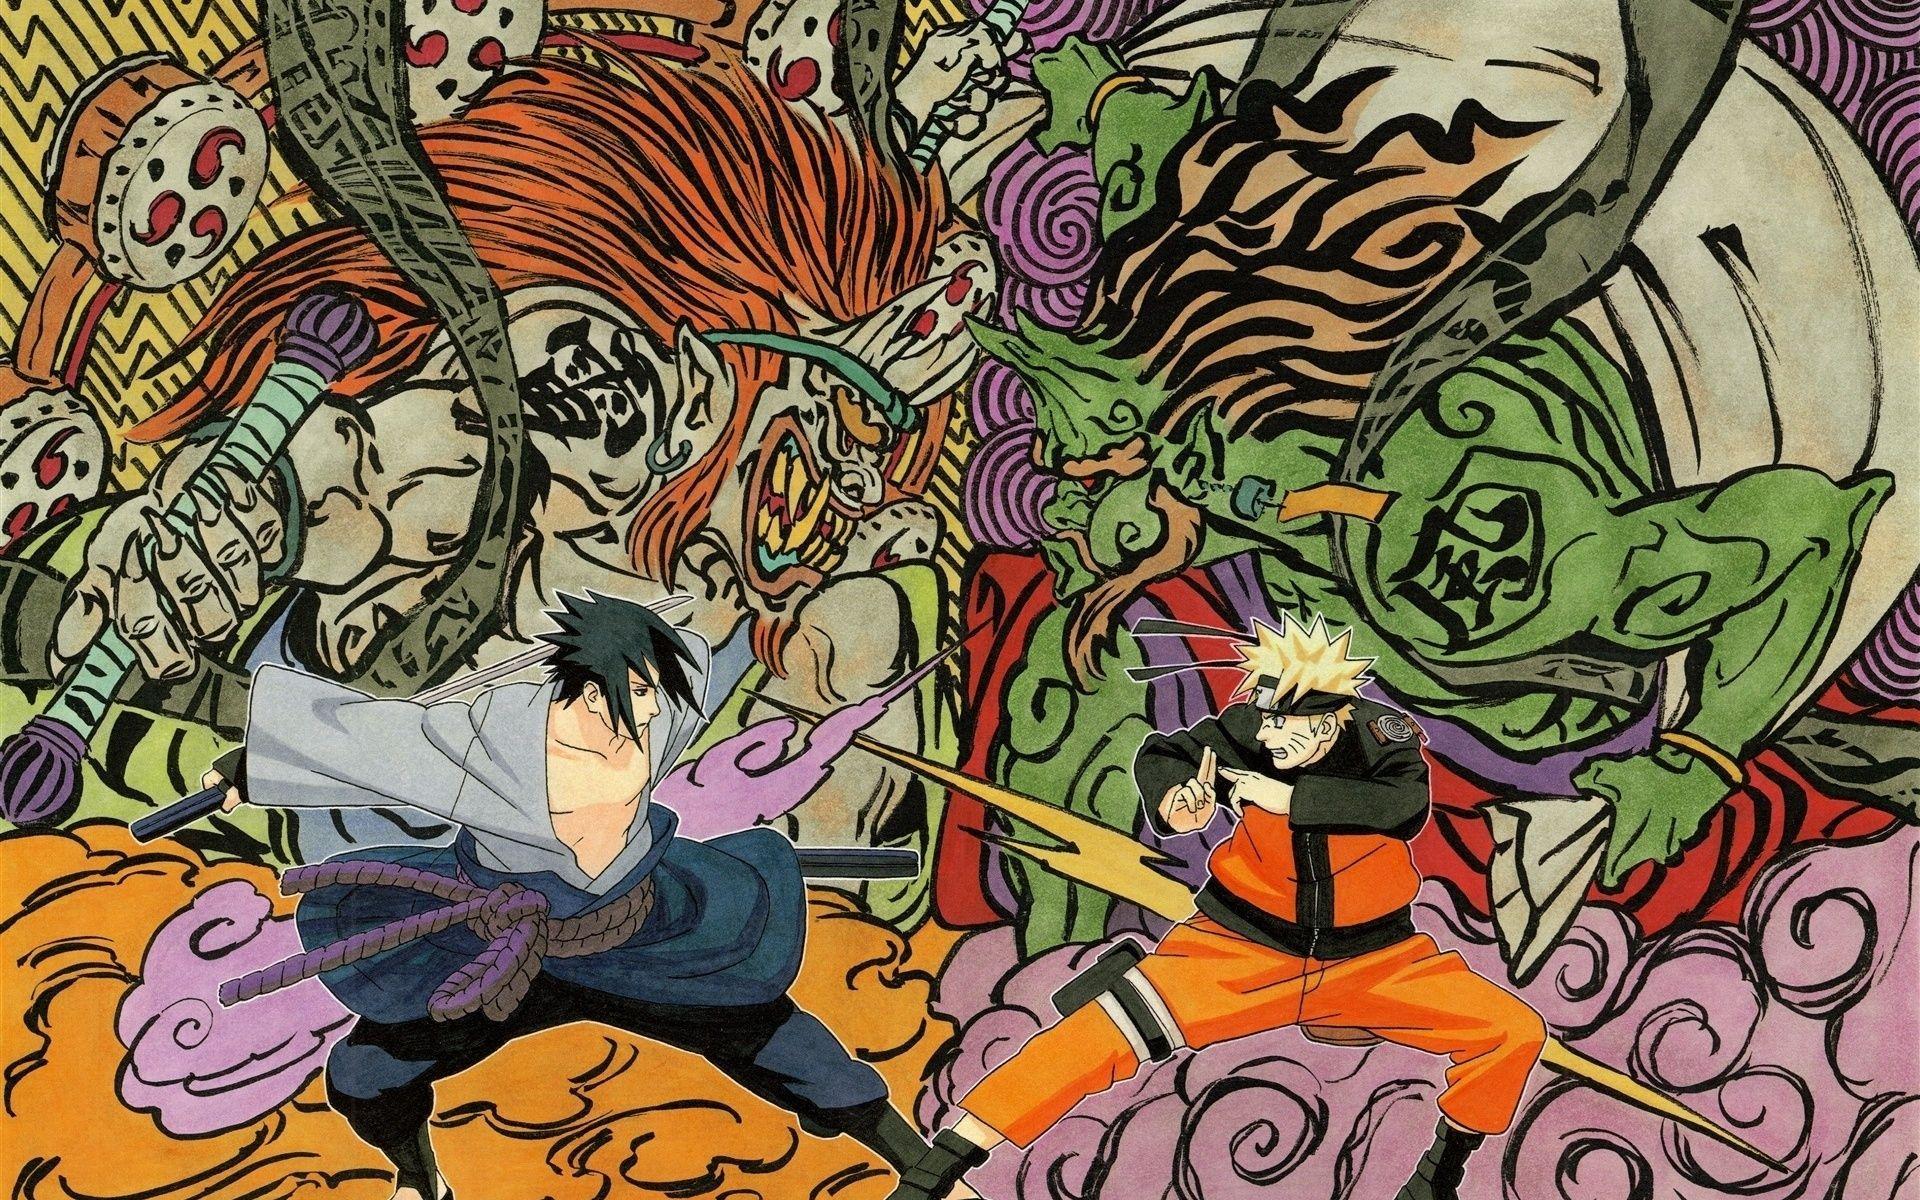 Naruto Art Wallpapers Top Free Naruto Art Backgrounds